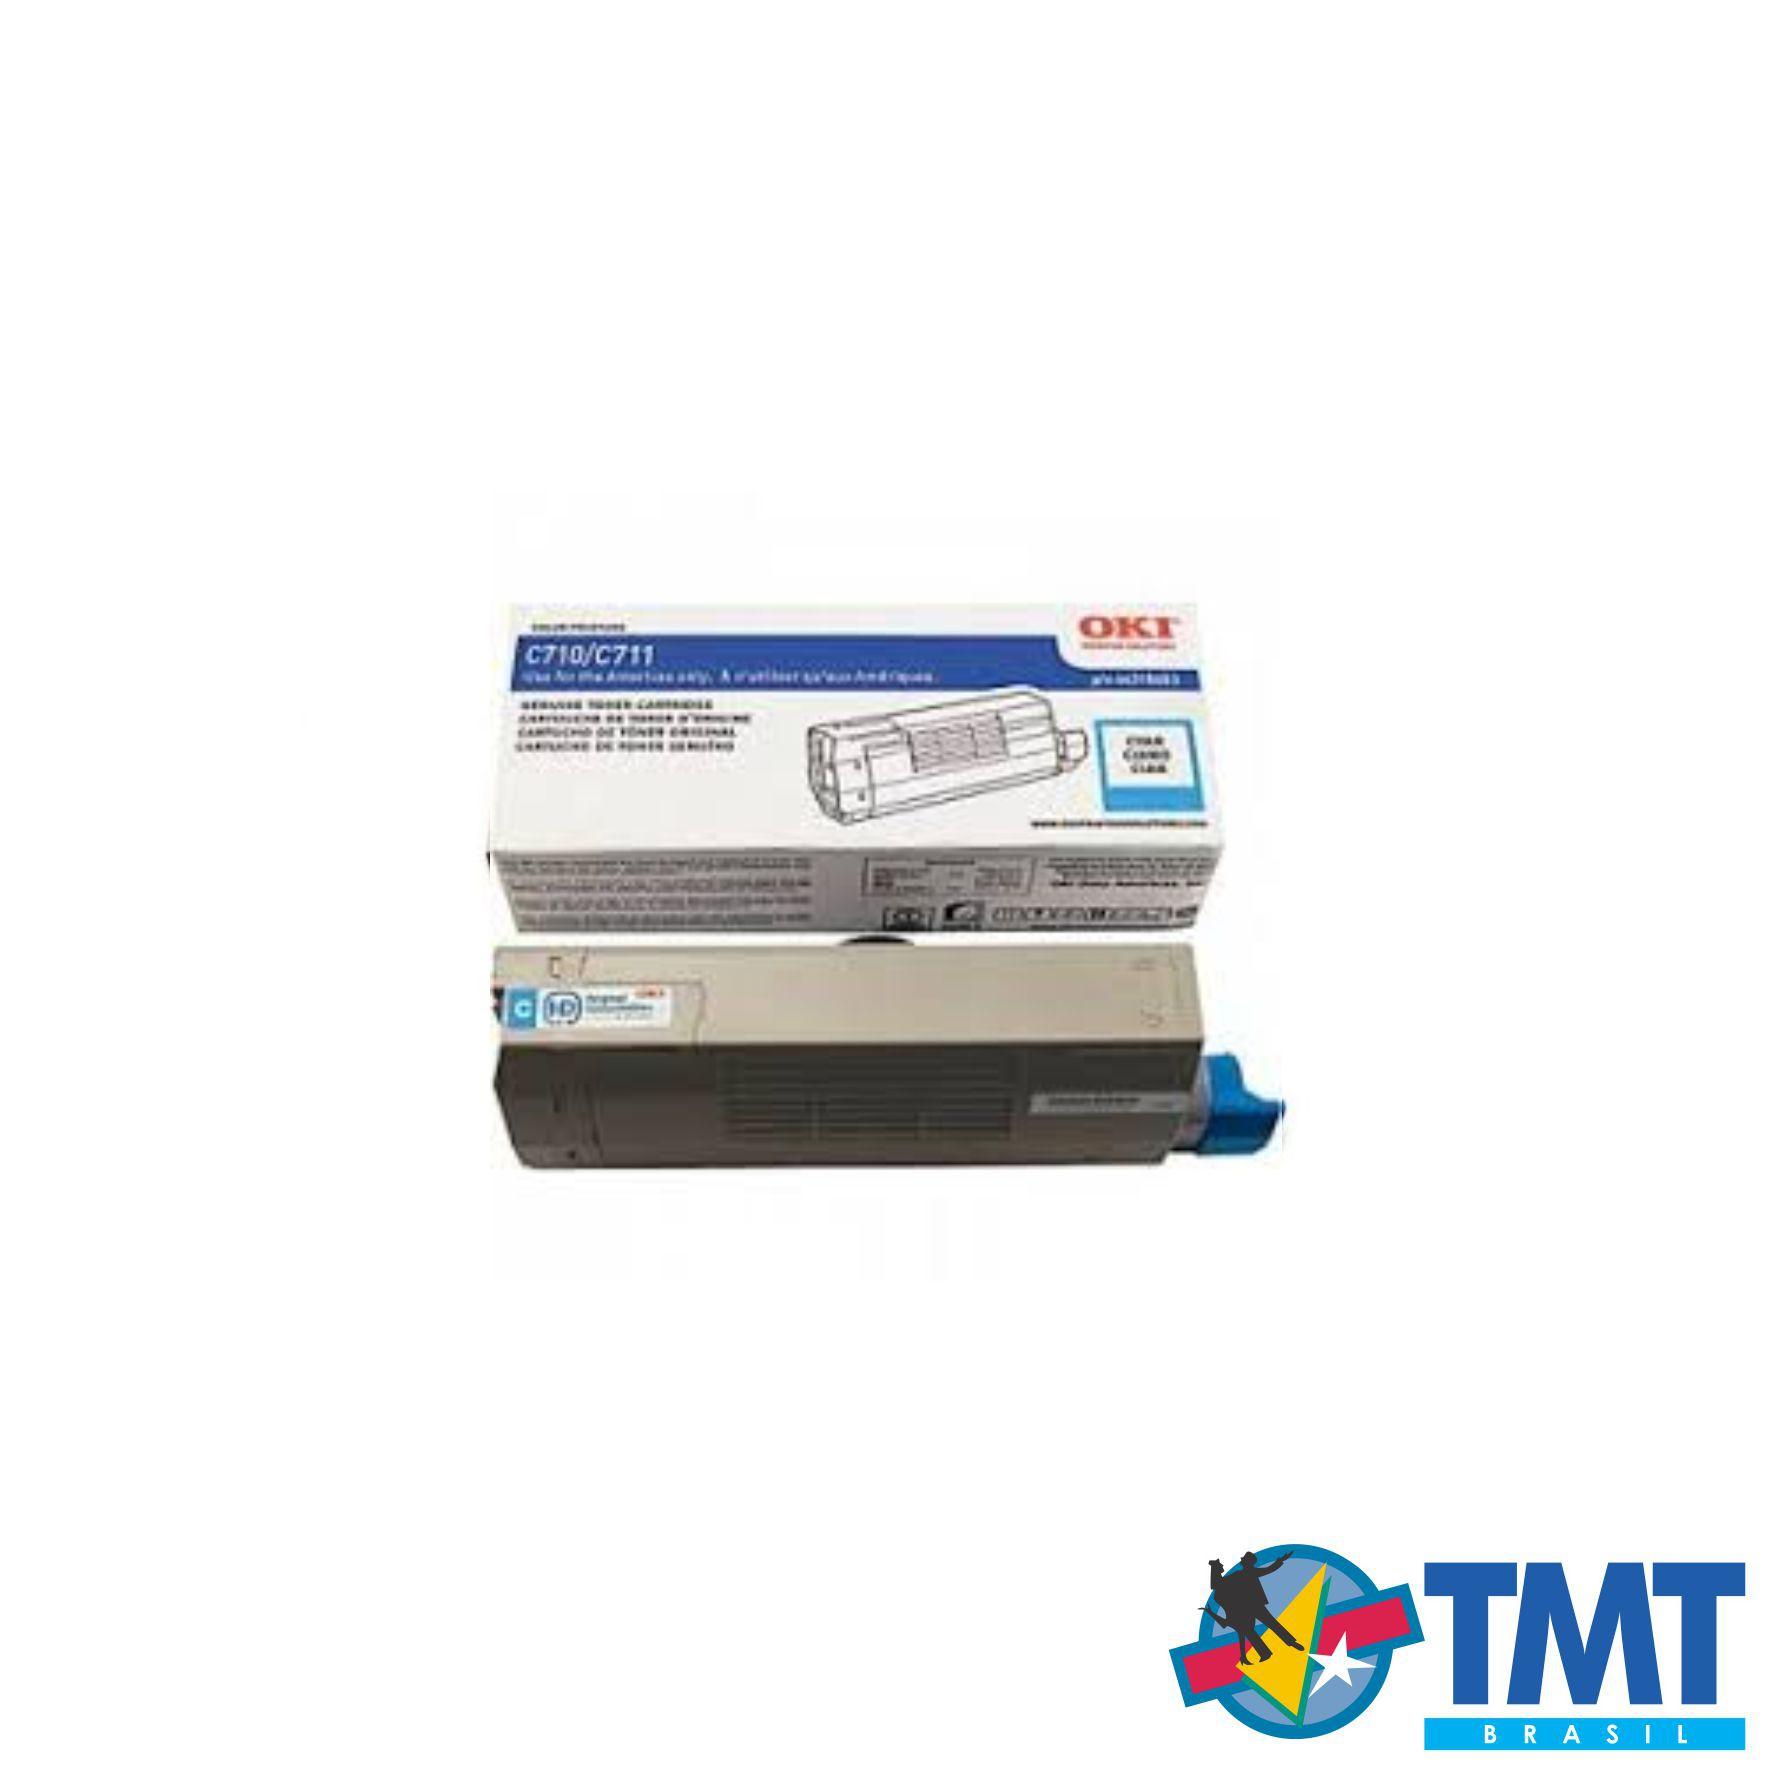 Cartucho de Toner Ciano OKI C711 - Alta Capacidade